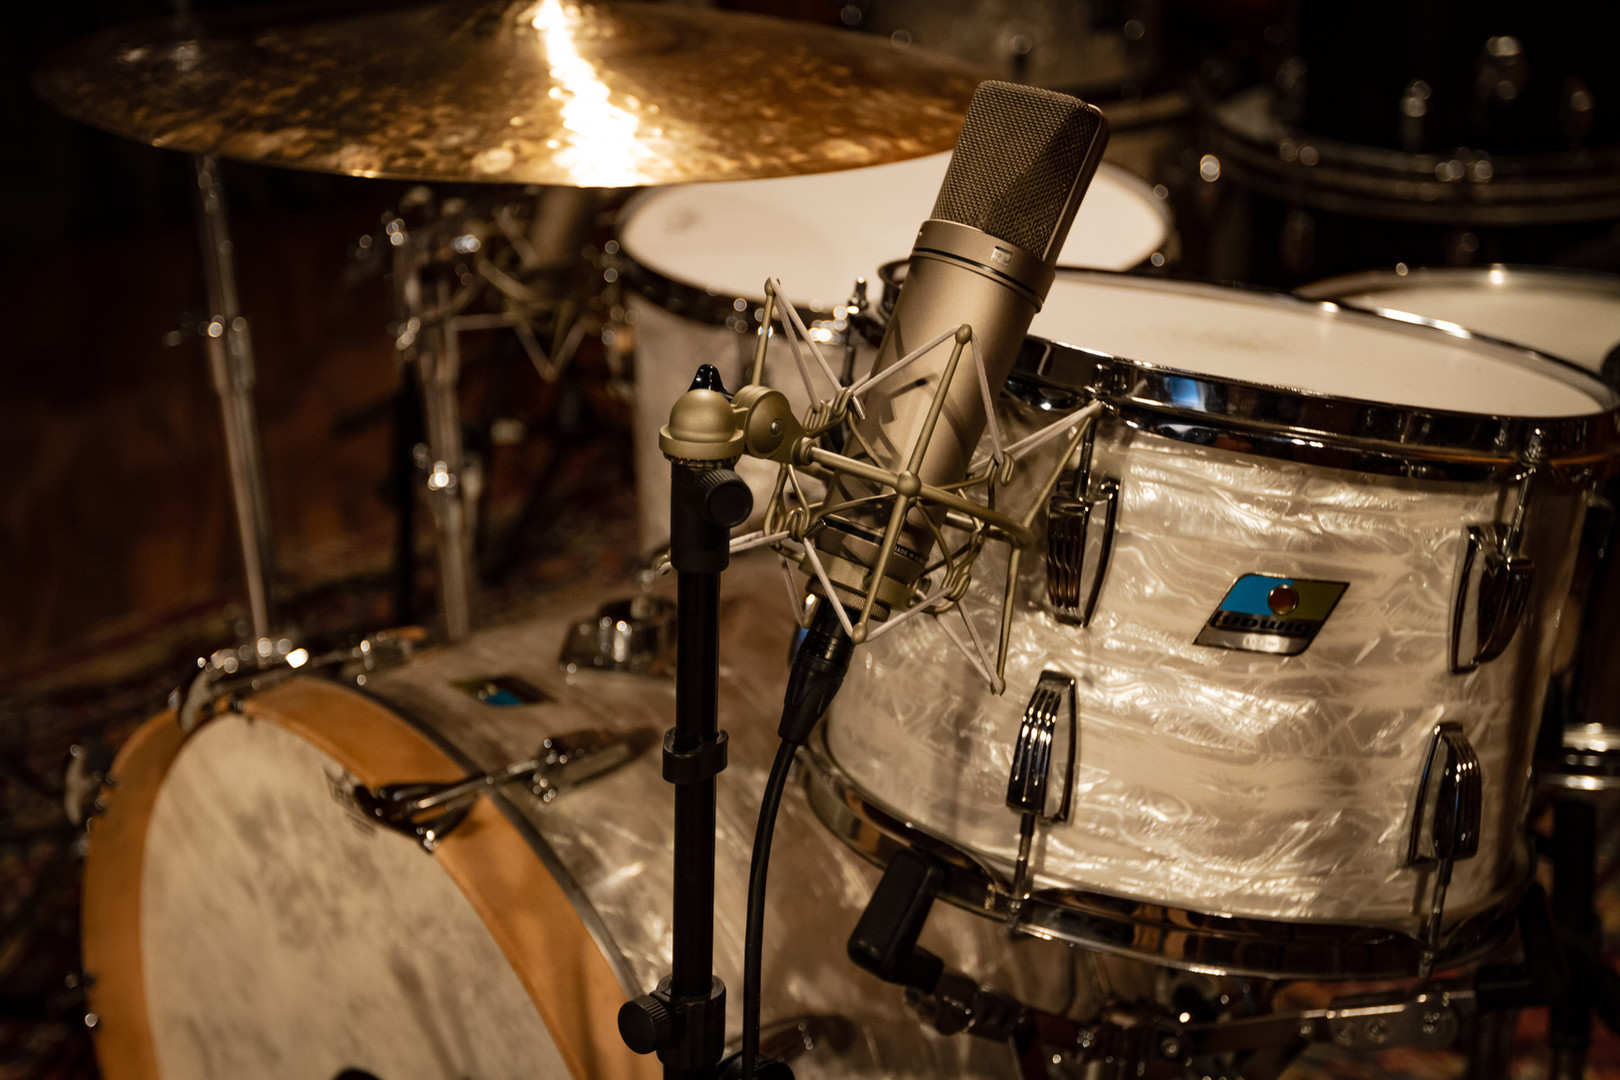 Drums and U87